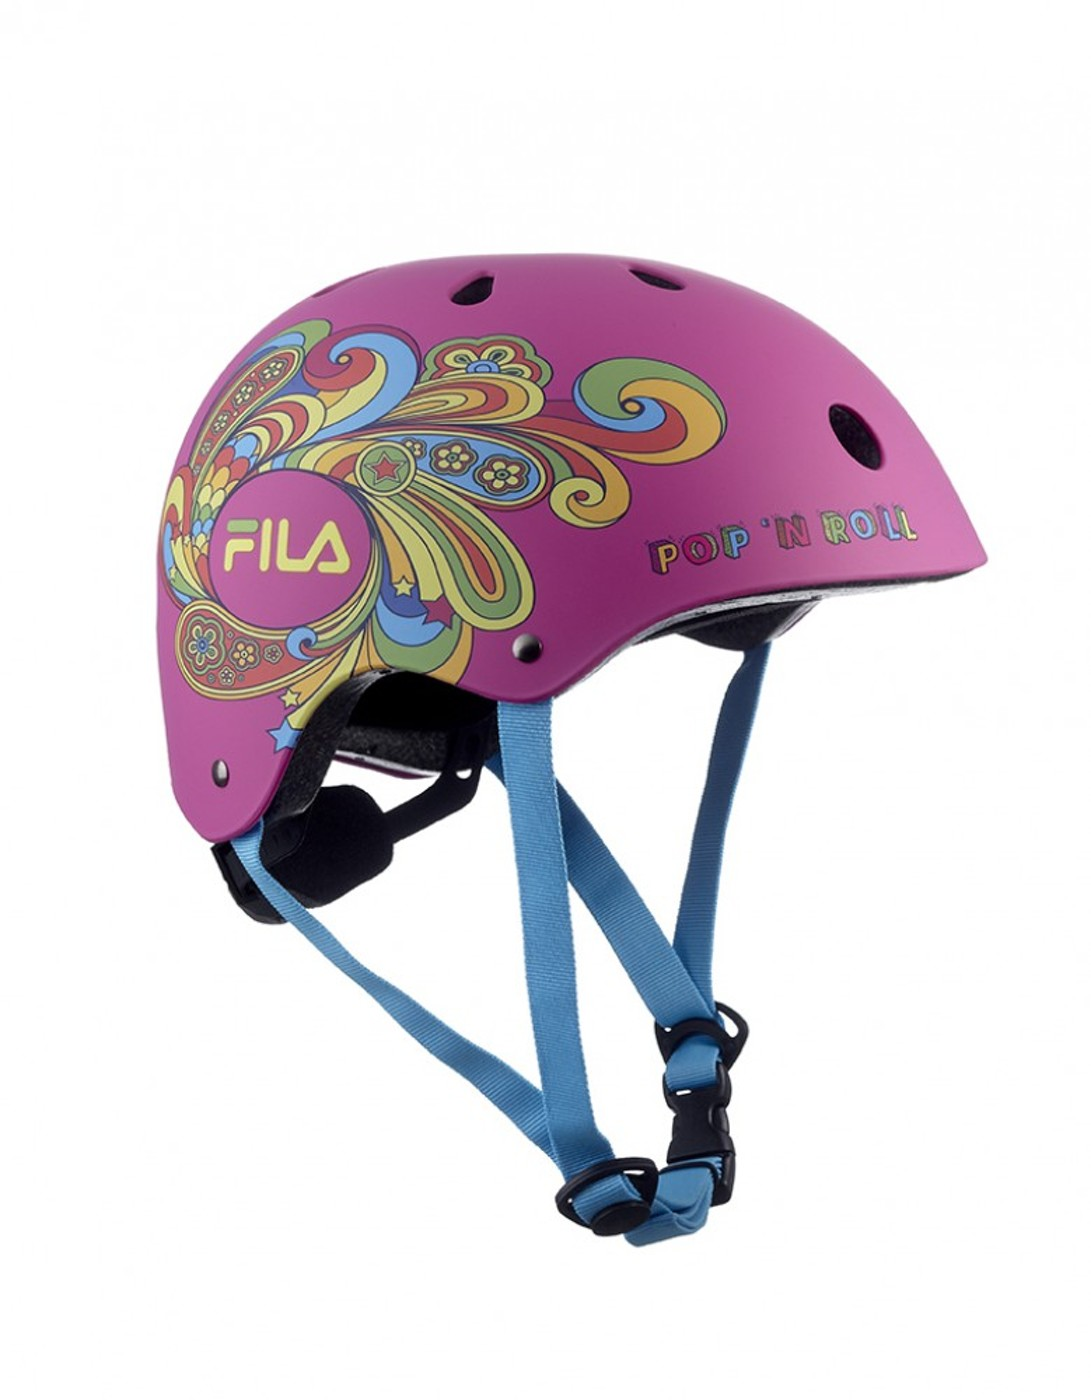 FILA BELLA Helmet